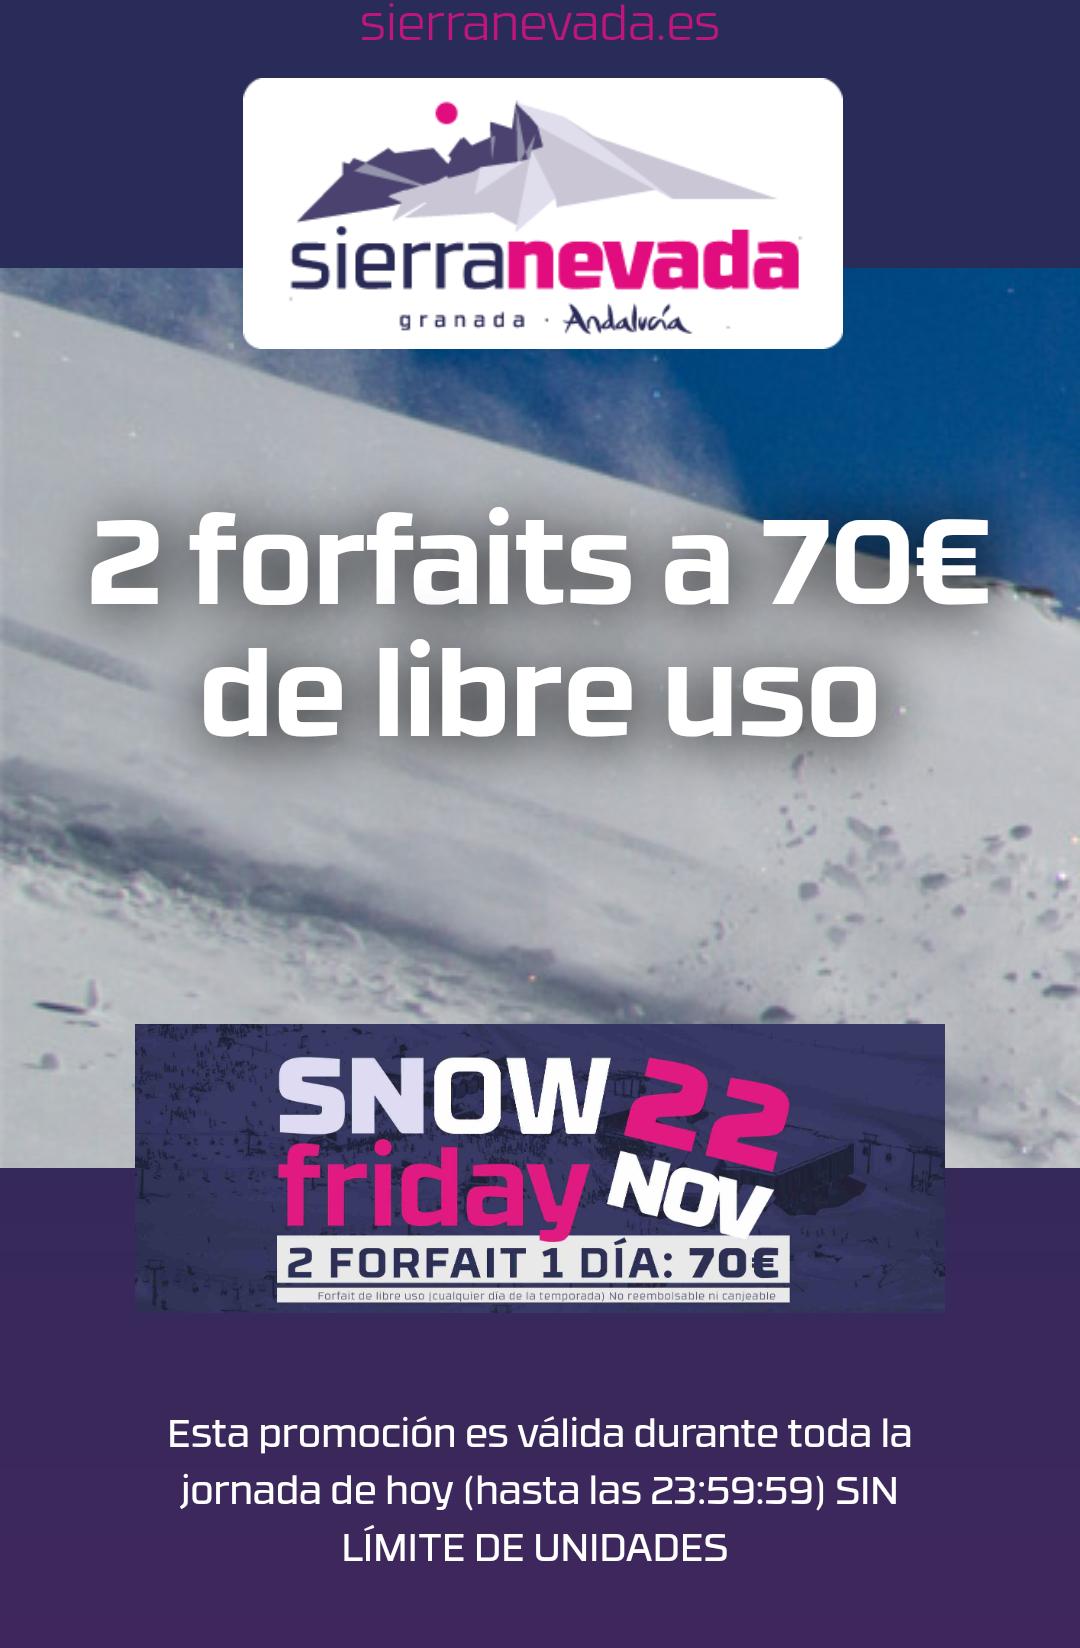 Snow Friday. 2 Dias de Forfait en Sierra Nevada por 70€